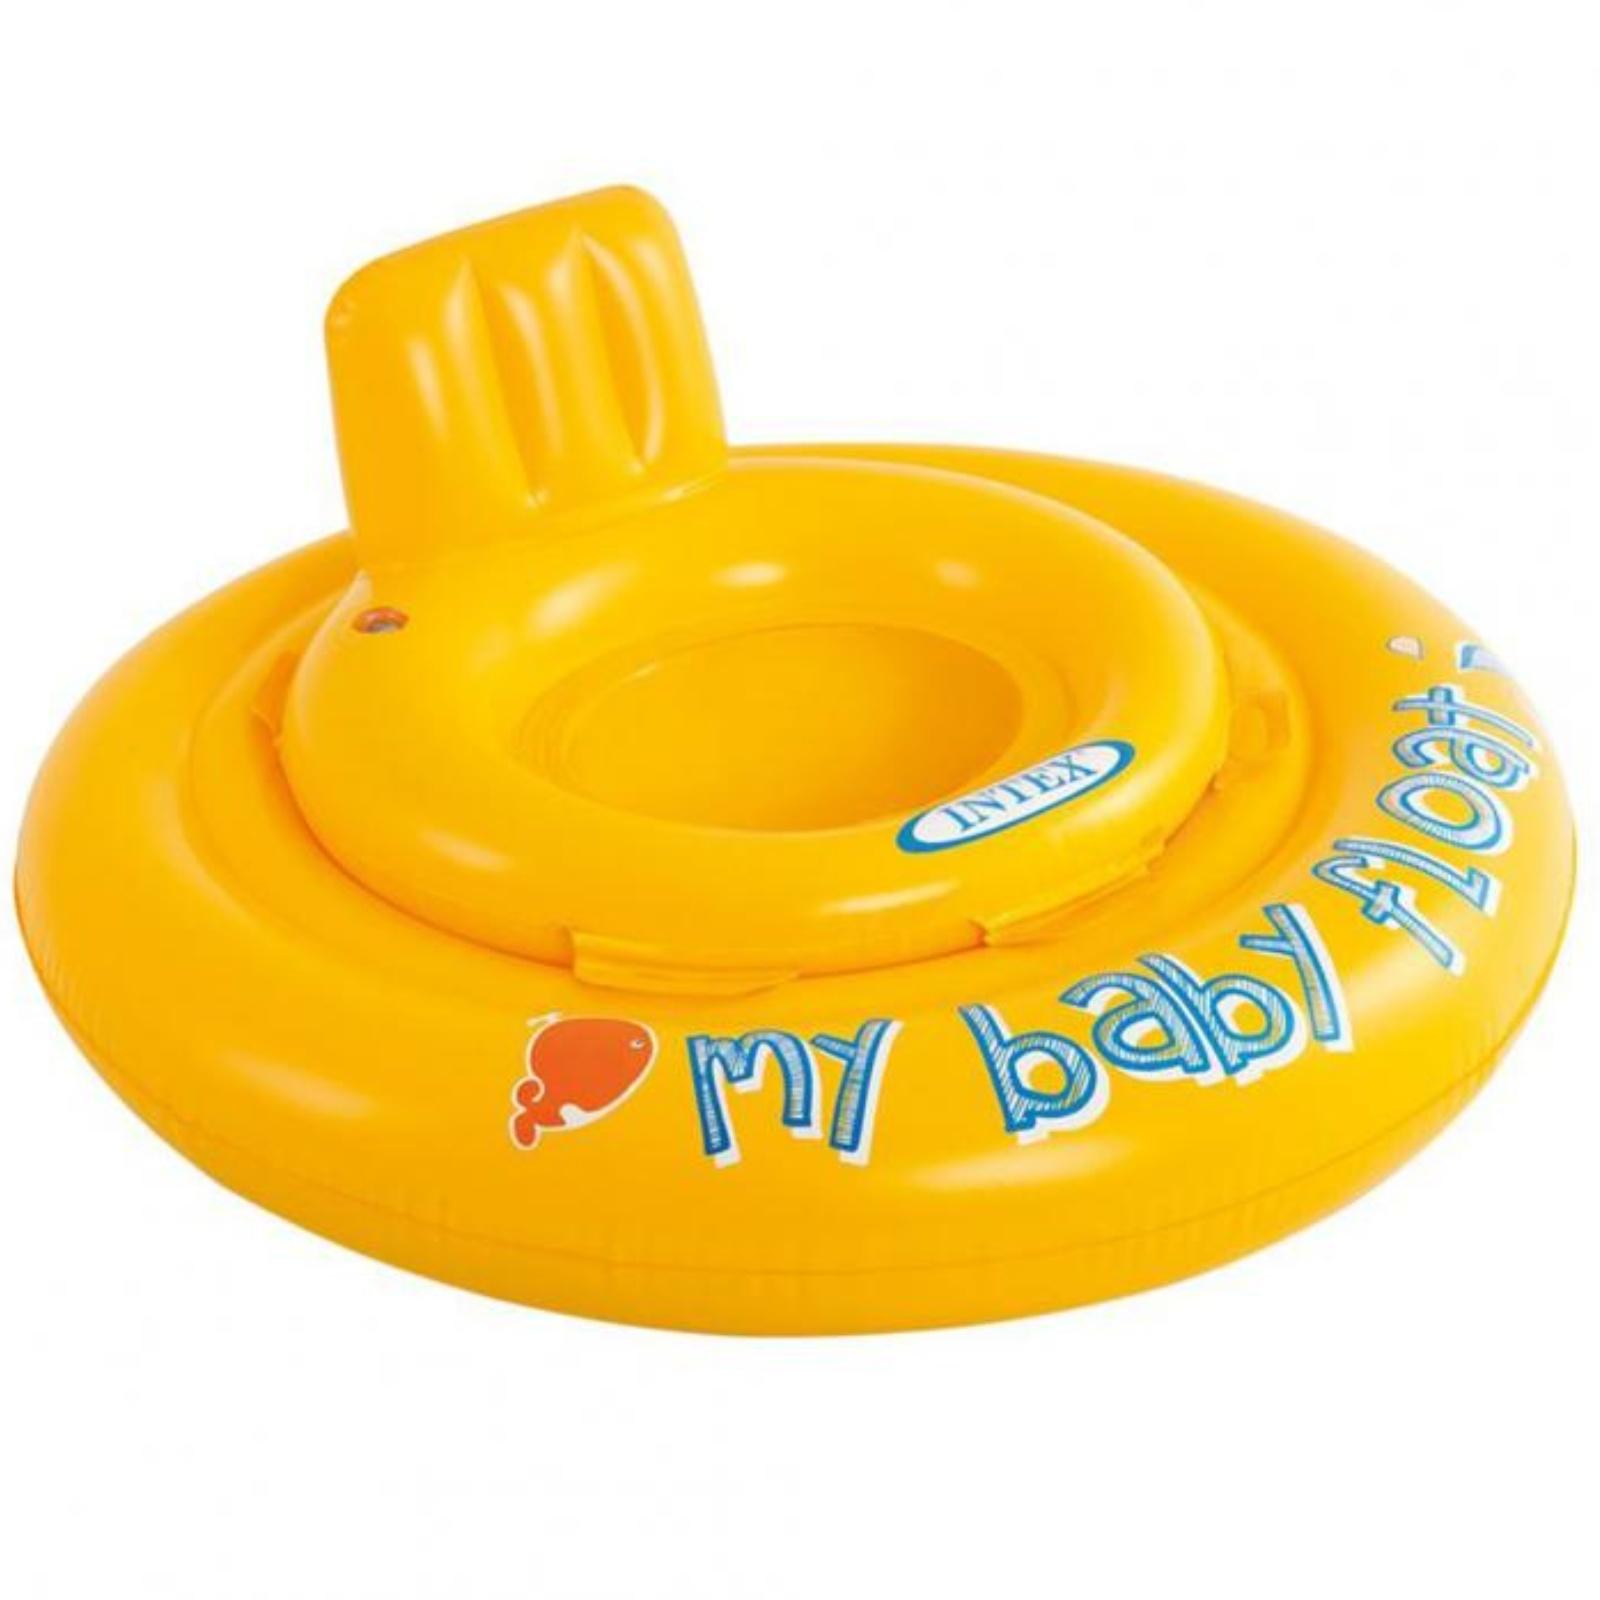 Intex 56585 My Baby Float